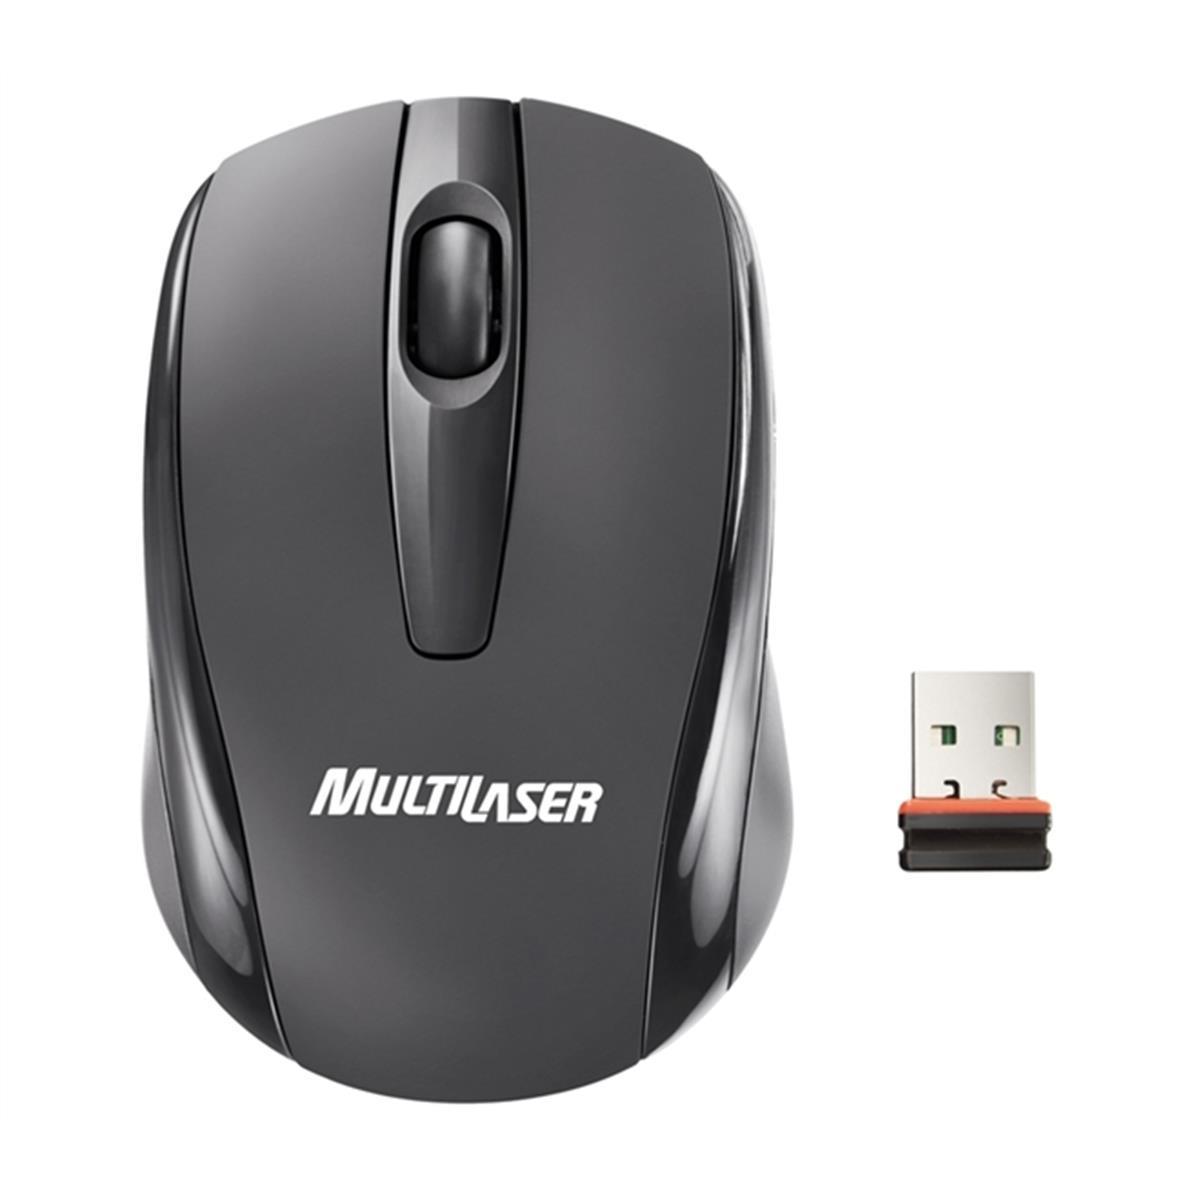 Mini Mouse Óptico Usb Nano sem fio 2,4GHz Multilaser  - Mix Eletro